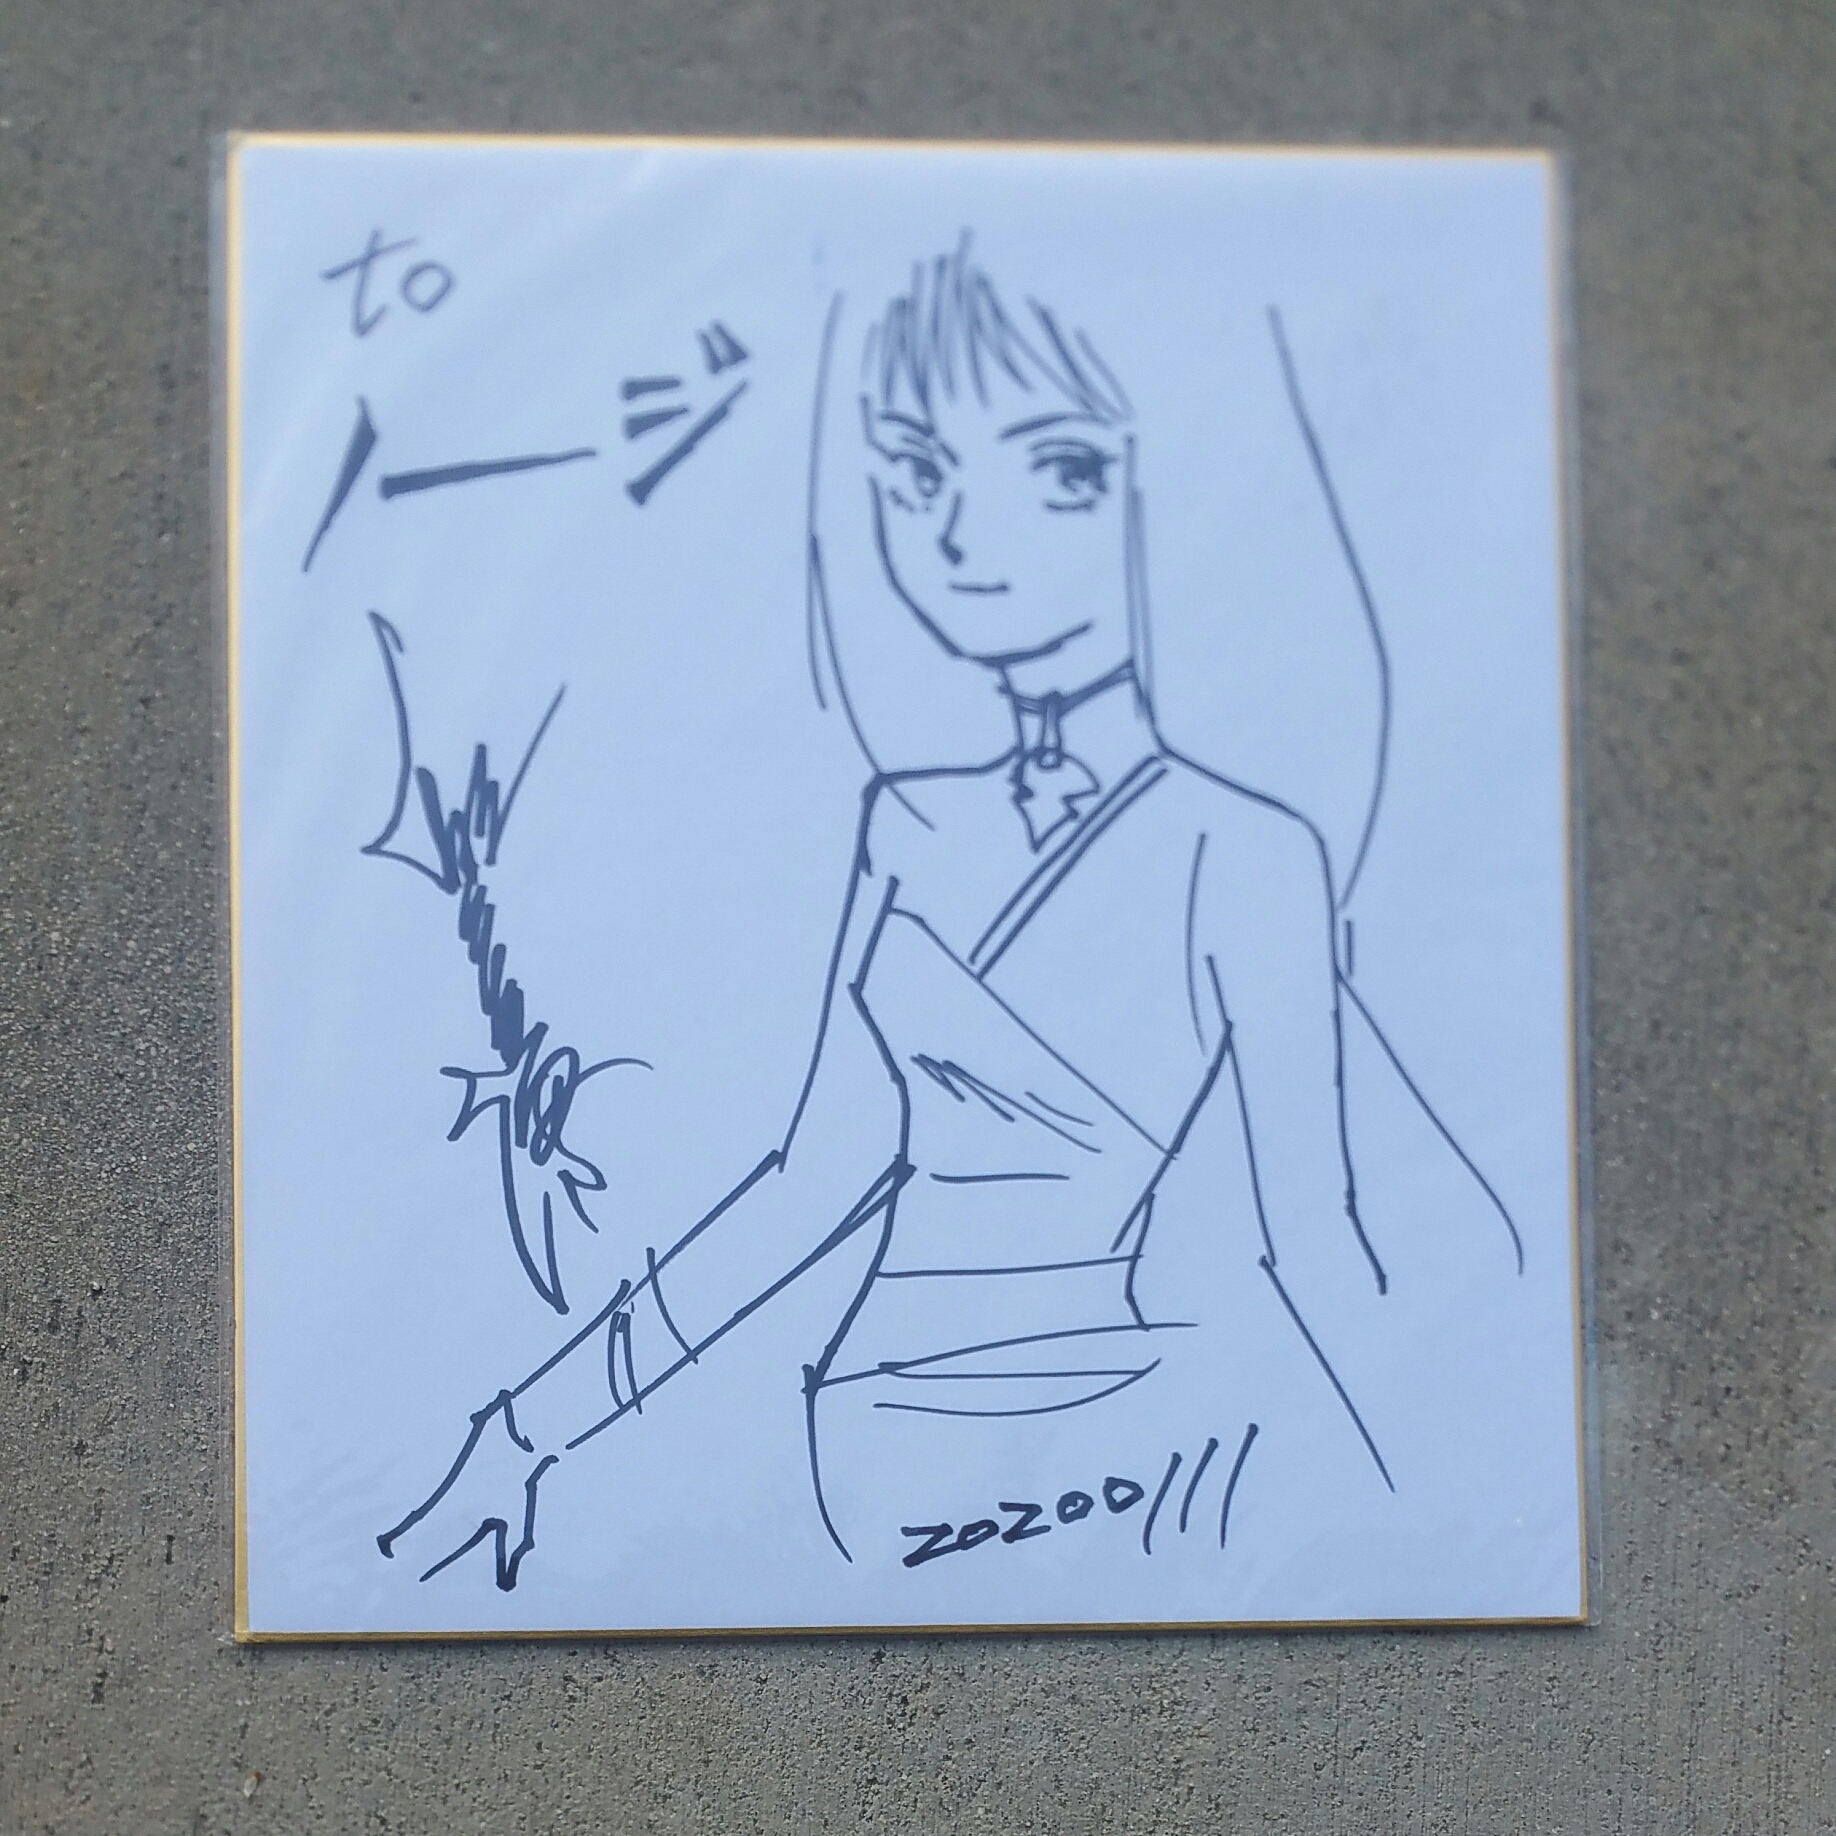 Tomonori Kogawa's panel (11) in  Animé Los Angeles 2020